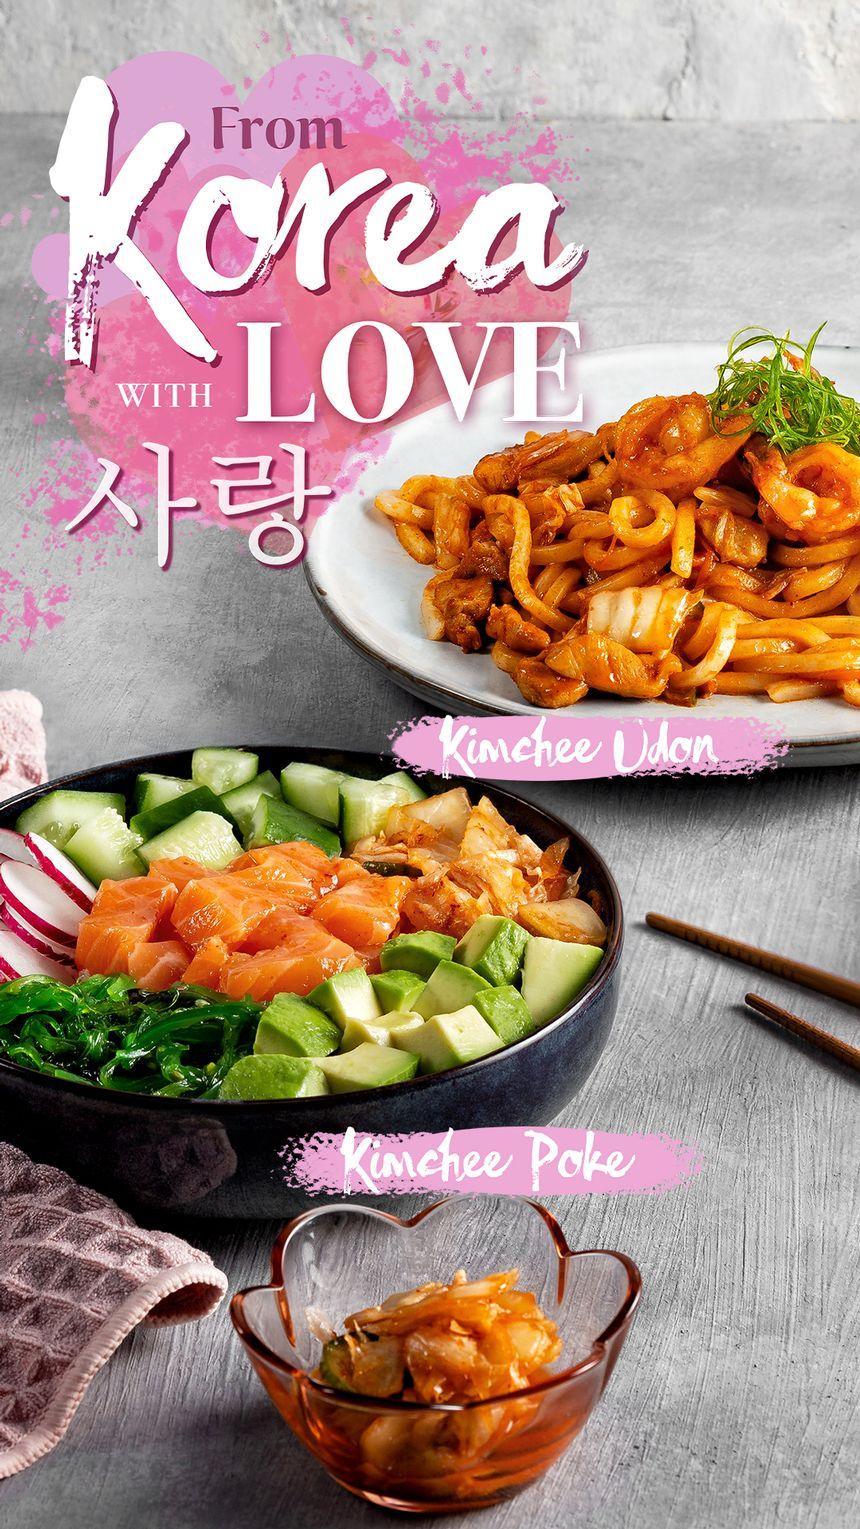 Sumo Sushi February Specials, Kimchee Poke & Kimchee Udon